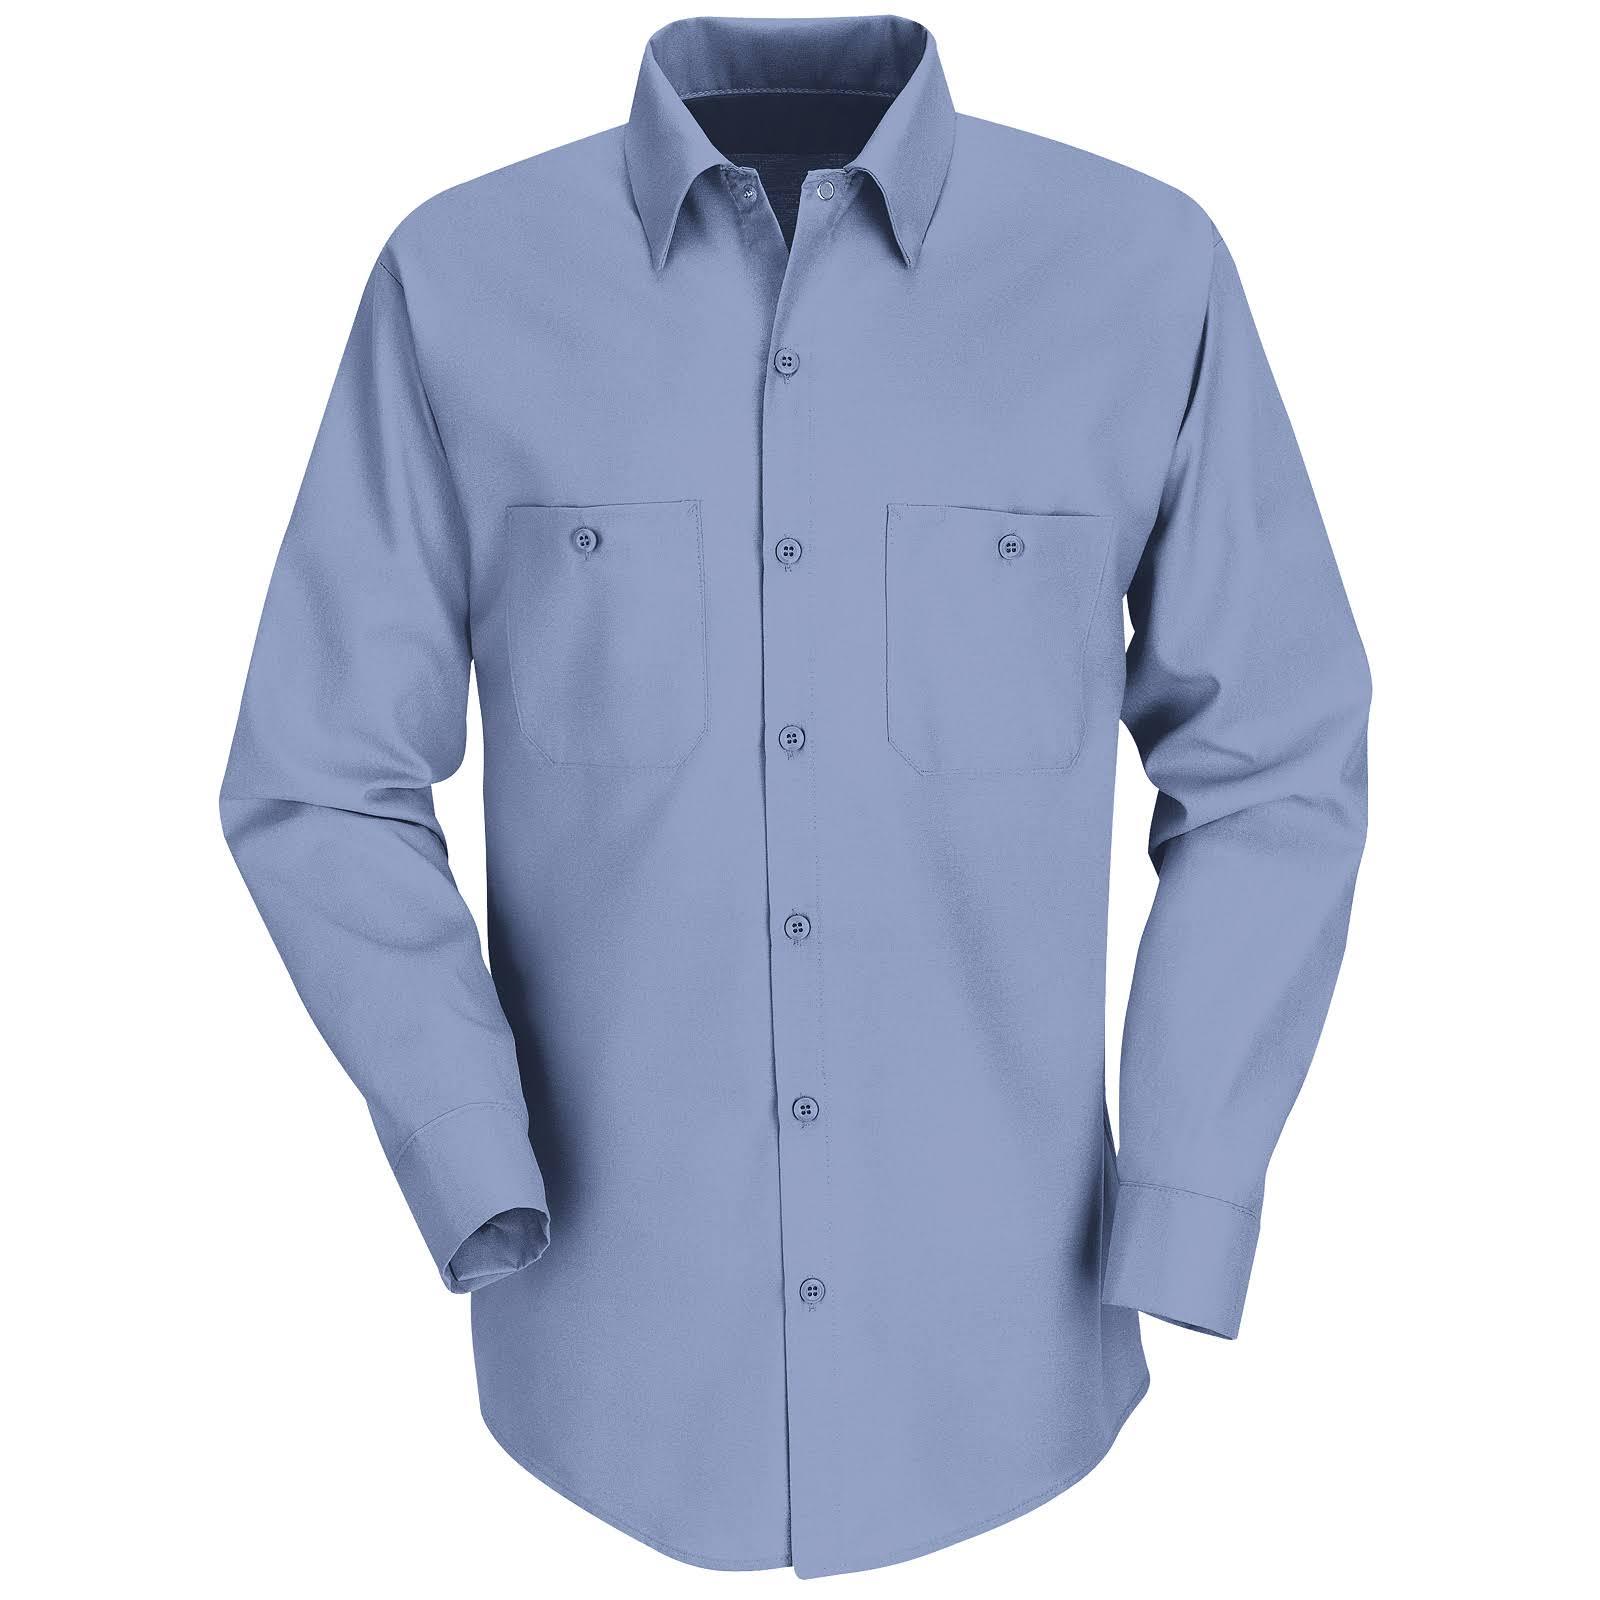 Industrial Red Trabajo M; Regular Para Kap Rg Hombre X Azul Camisa Claro De FqEpwxCX